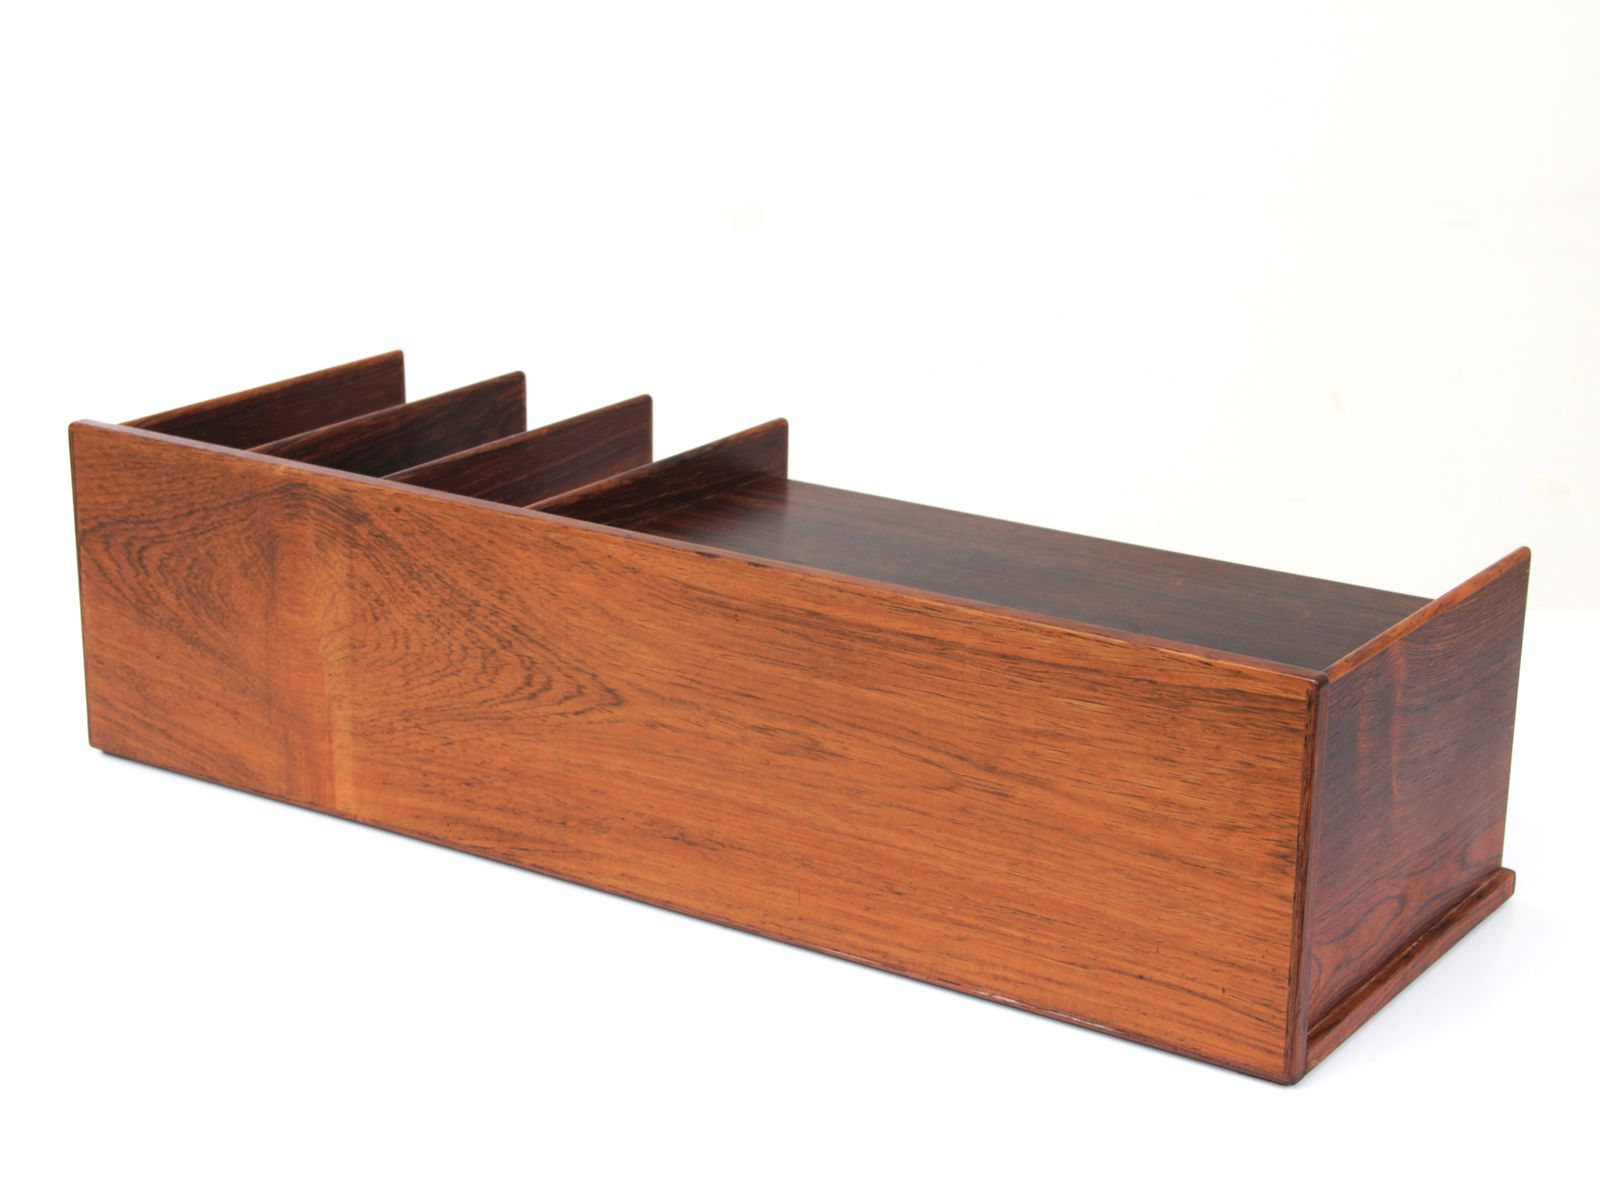 Mid Century Modern Desk Top Organizer in Rio Rosewood from Georg